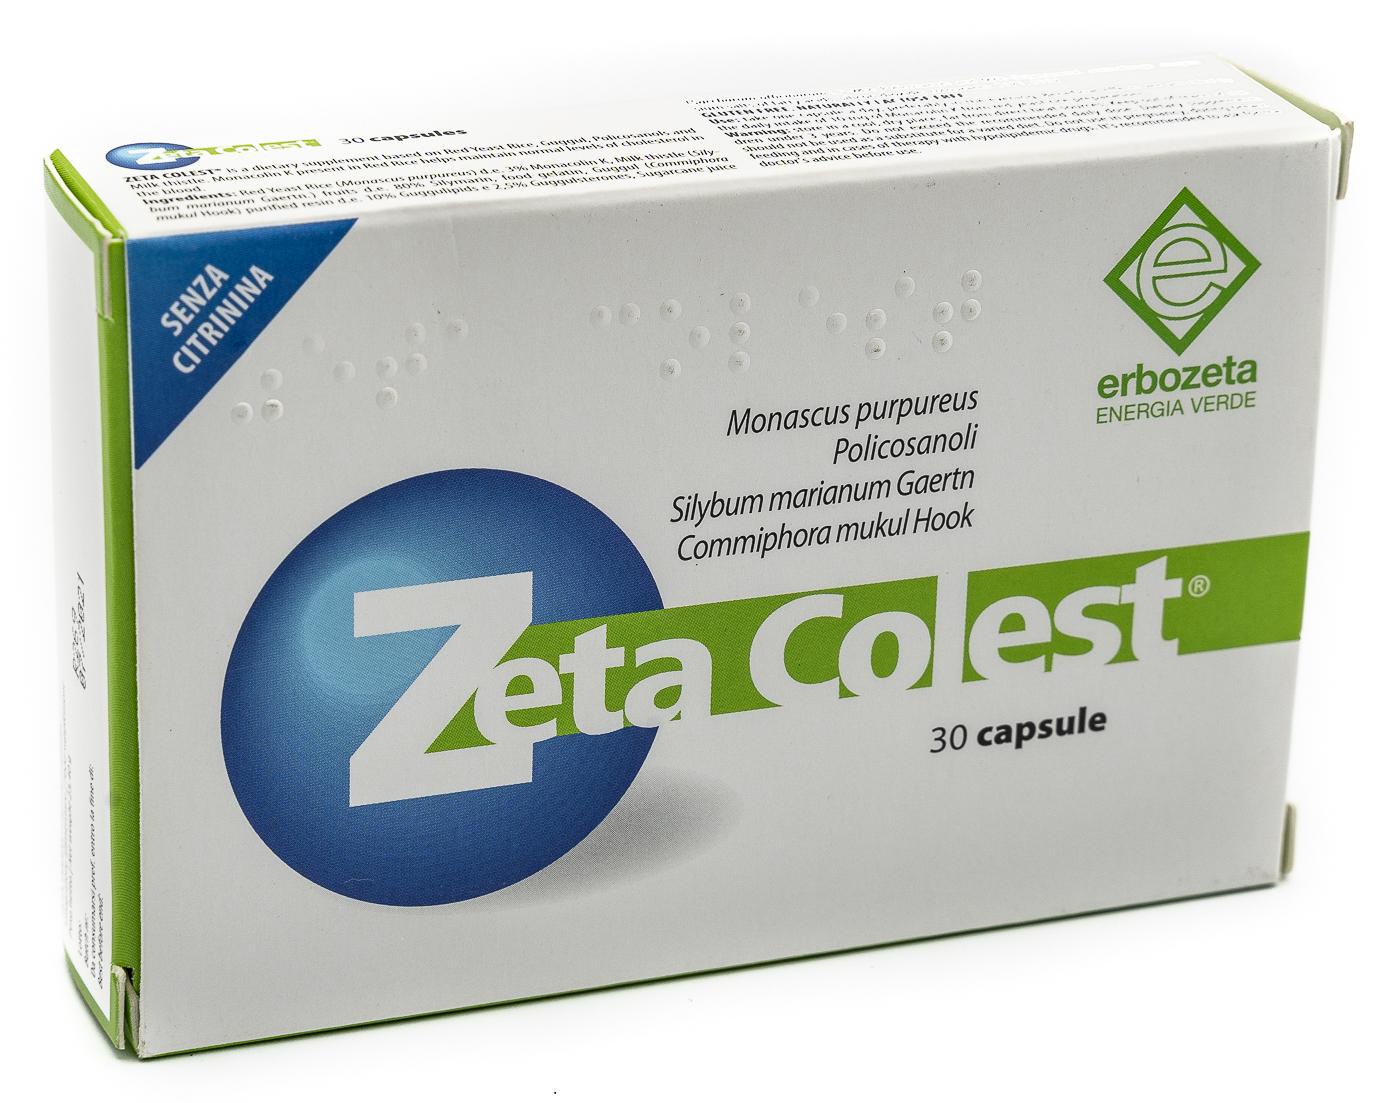 ERBOZETA SpA Zeta Colest 30cps